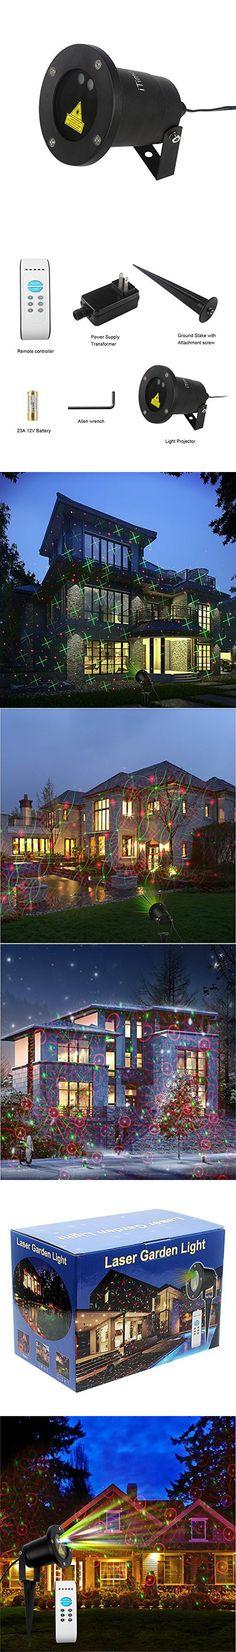 Christmas Laser Light,DRILLPRO Waterproof Red  Green Laser Light